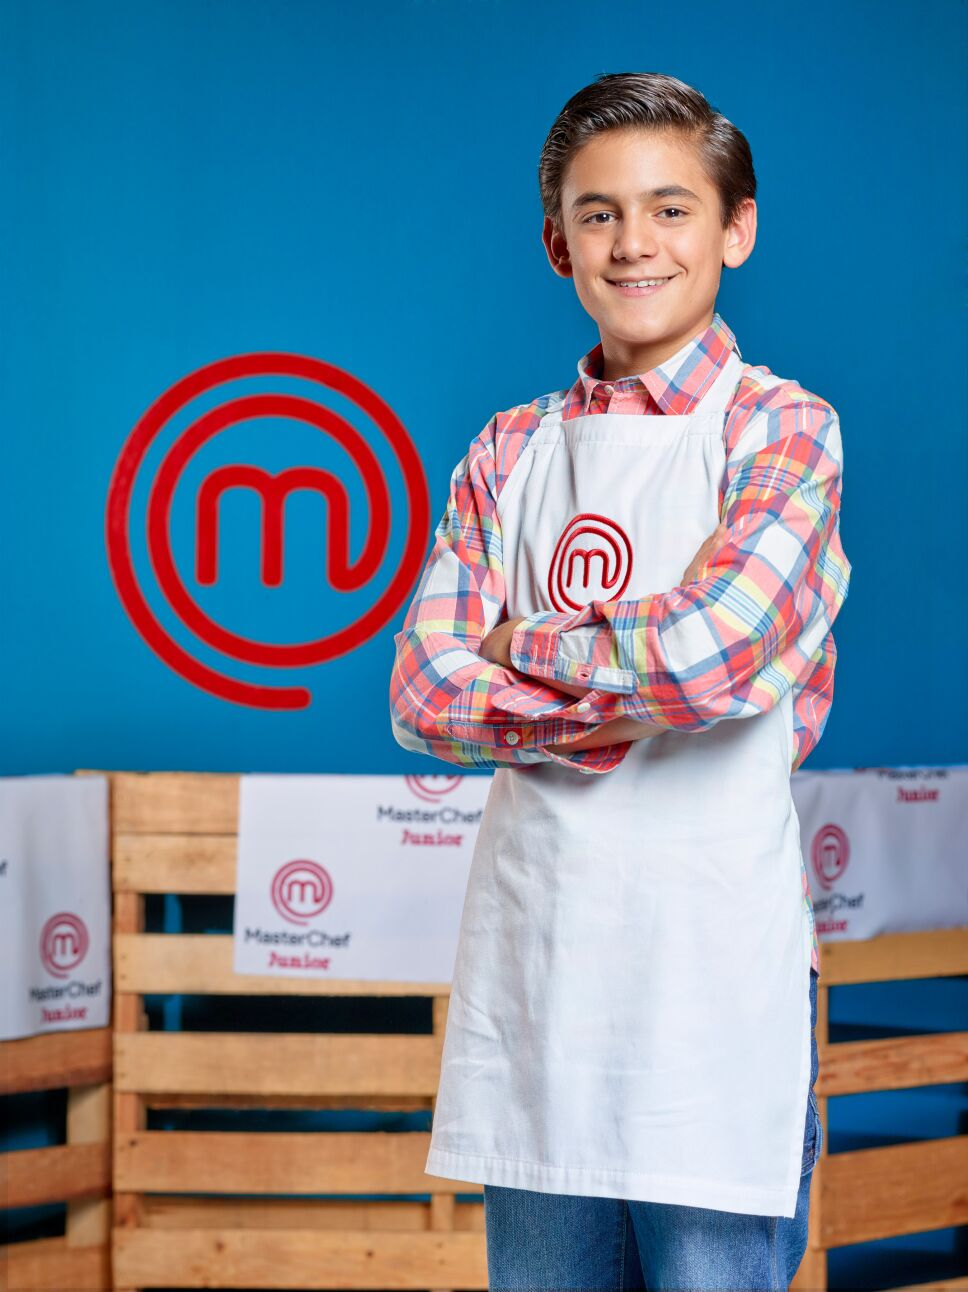 Alonso MasterChef Junior